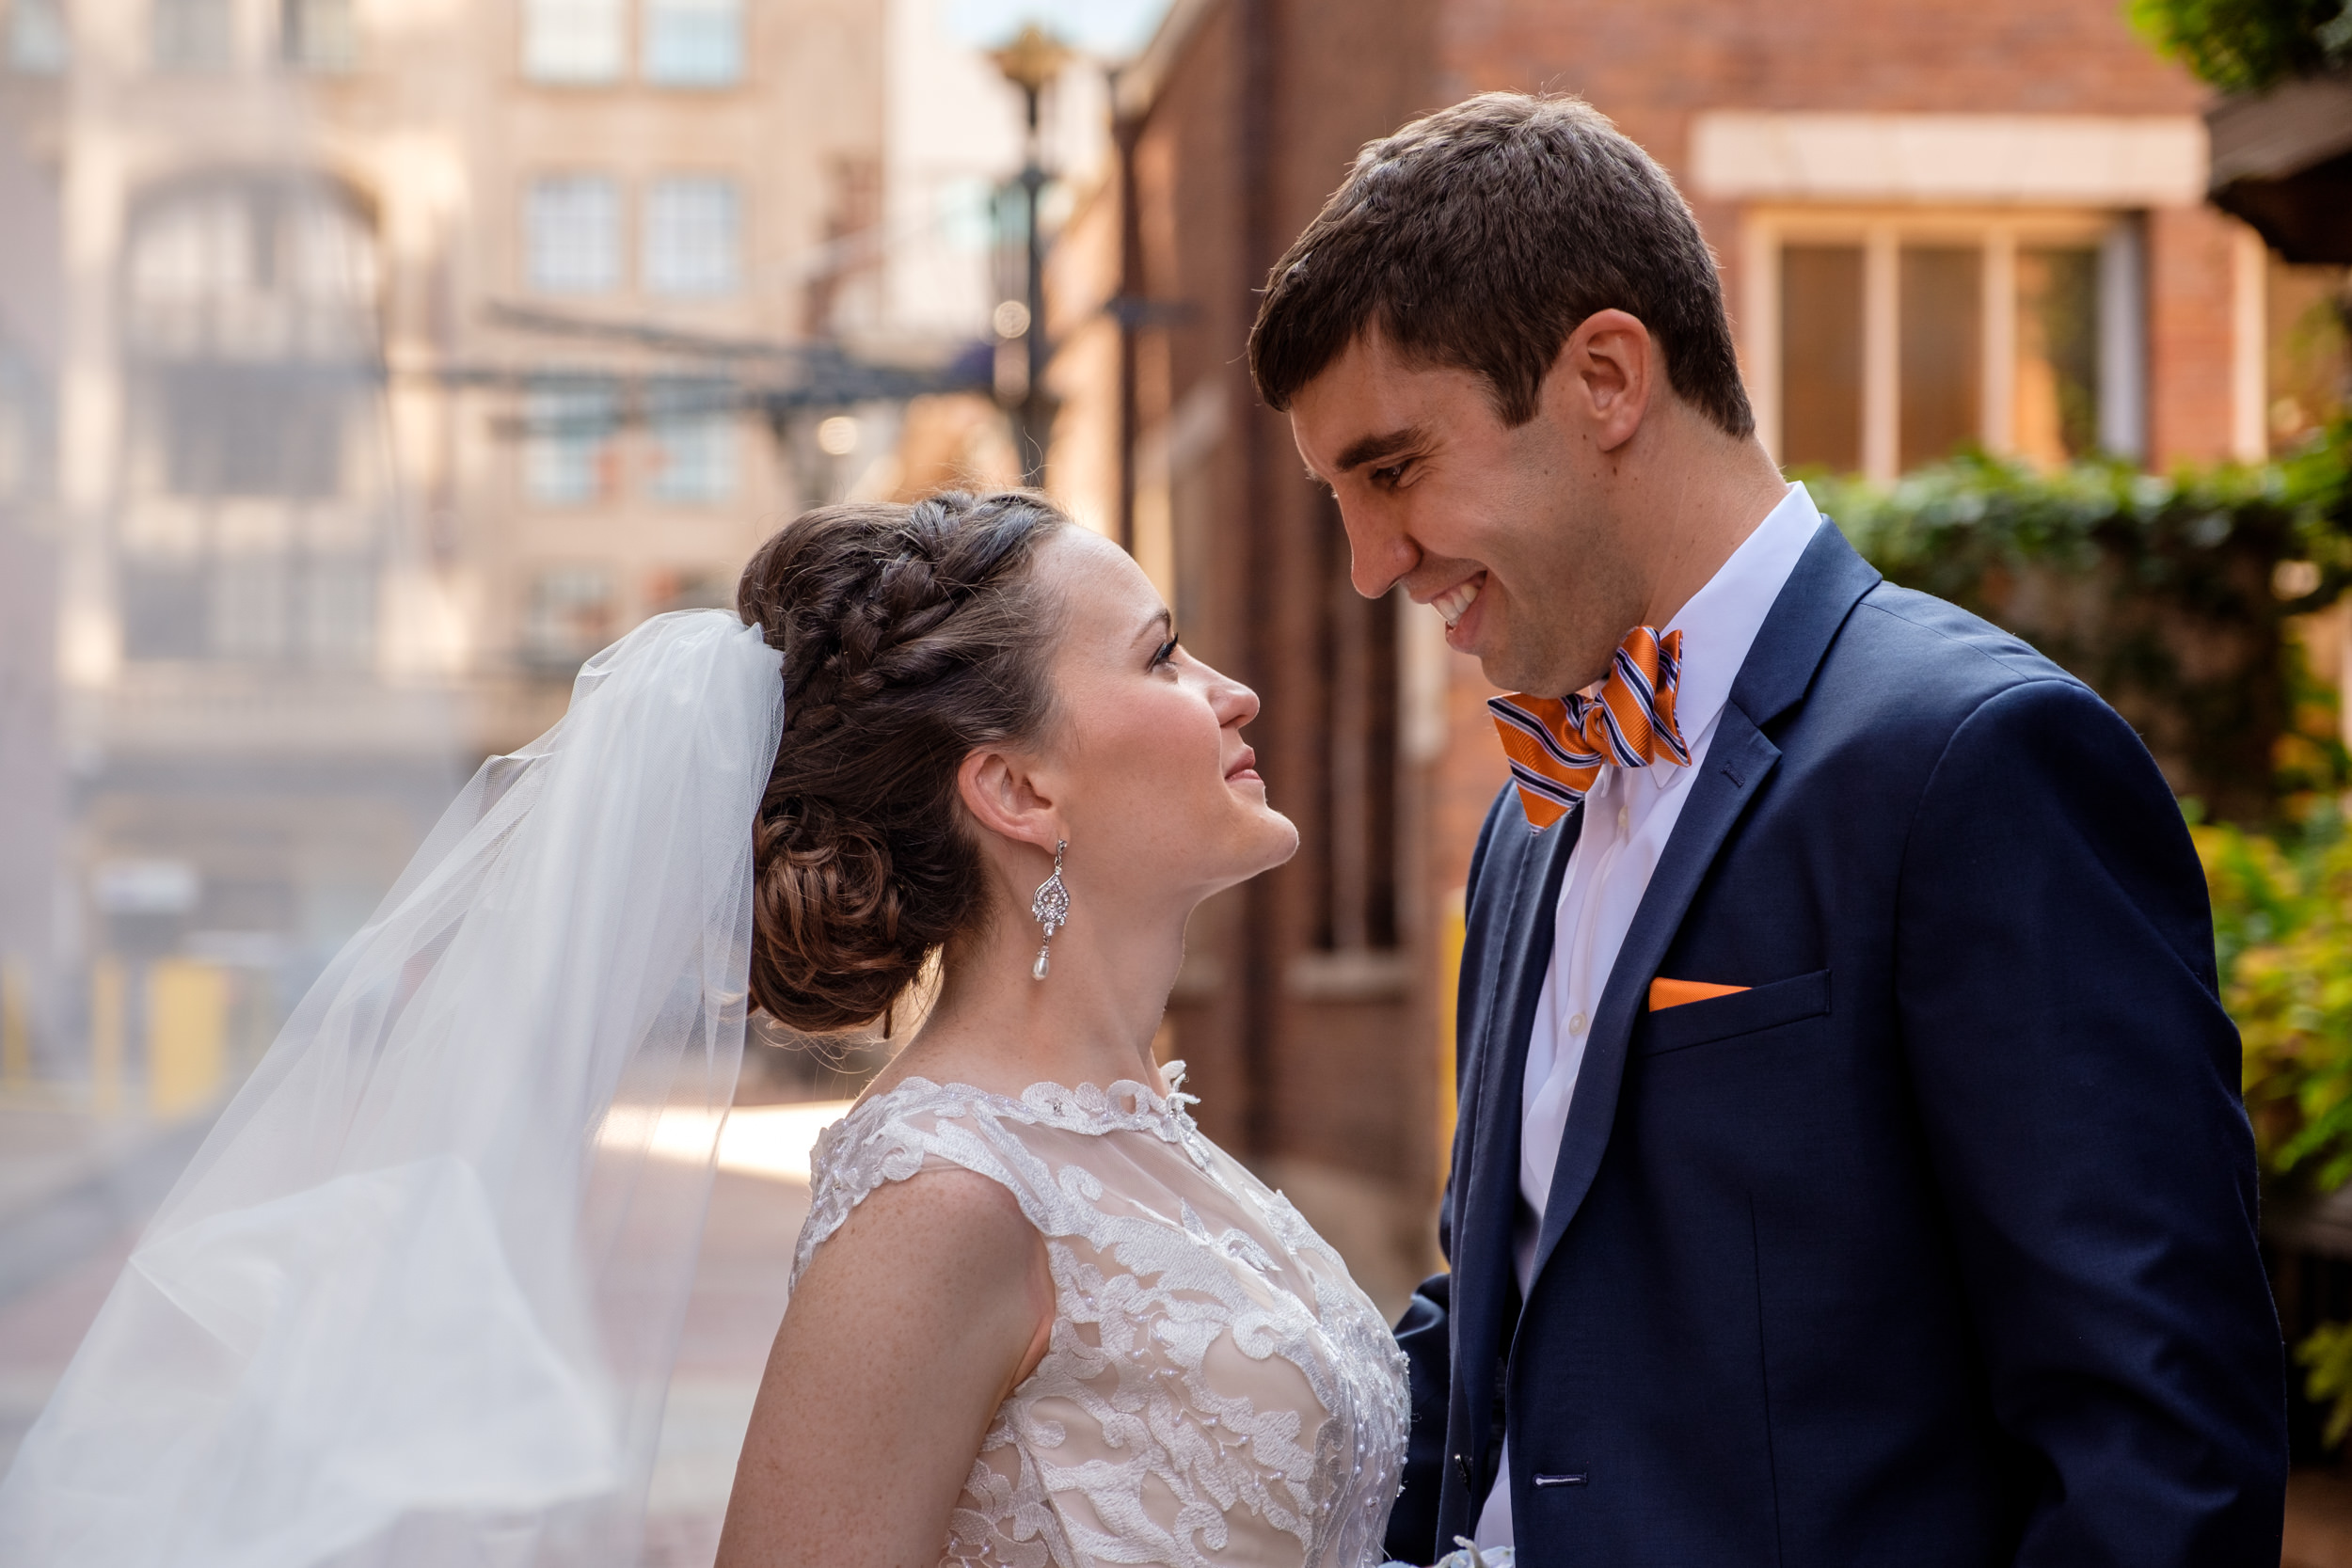 TheSmythCollective-Best-Cincinnati-Wedding-Photographer-035.jpg